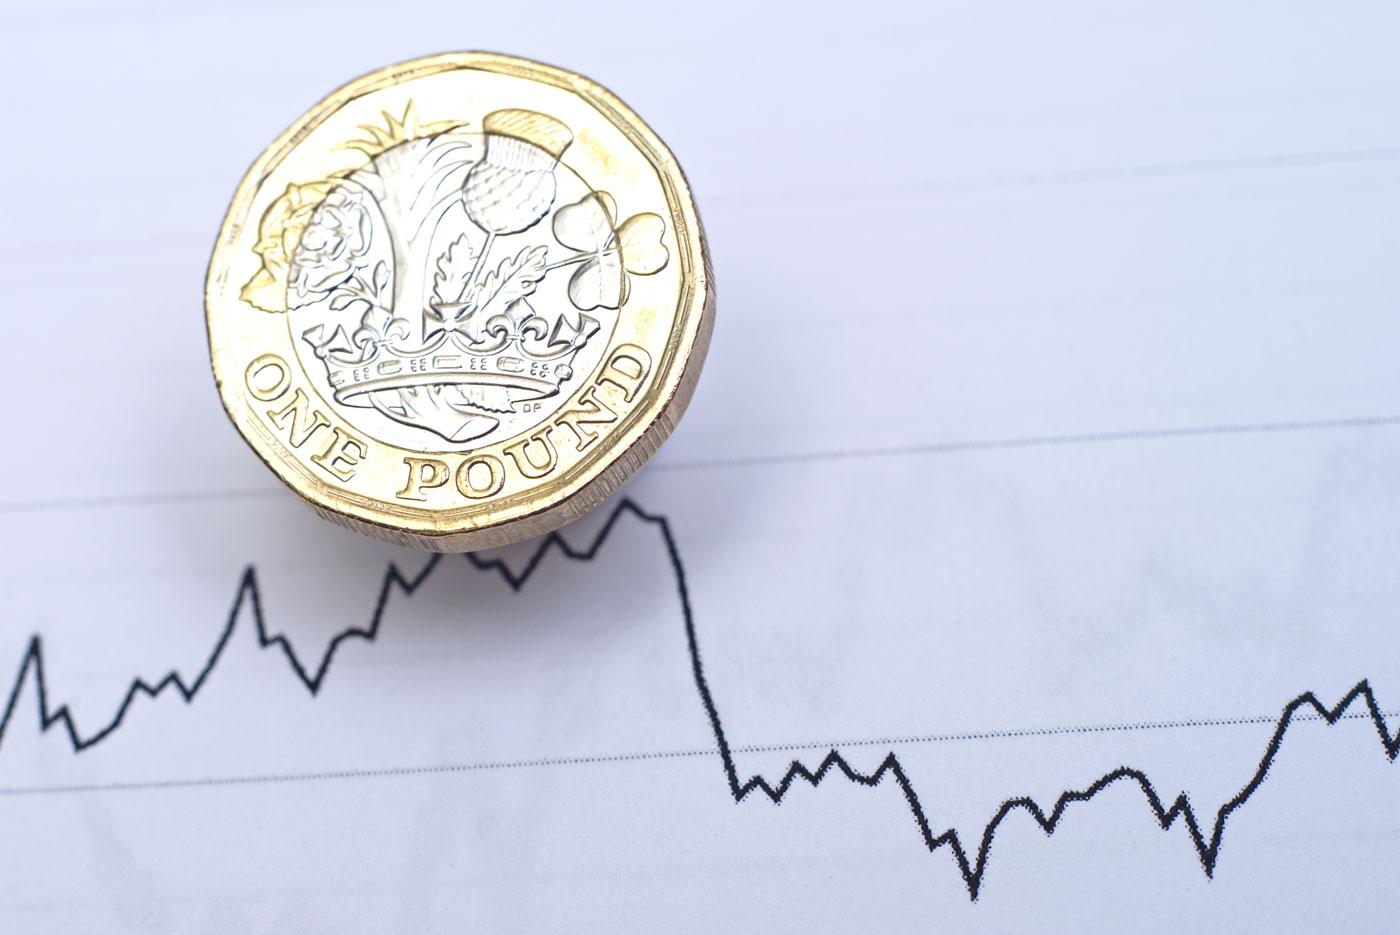 pound sterling exchange rate decline